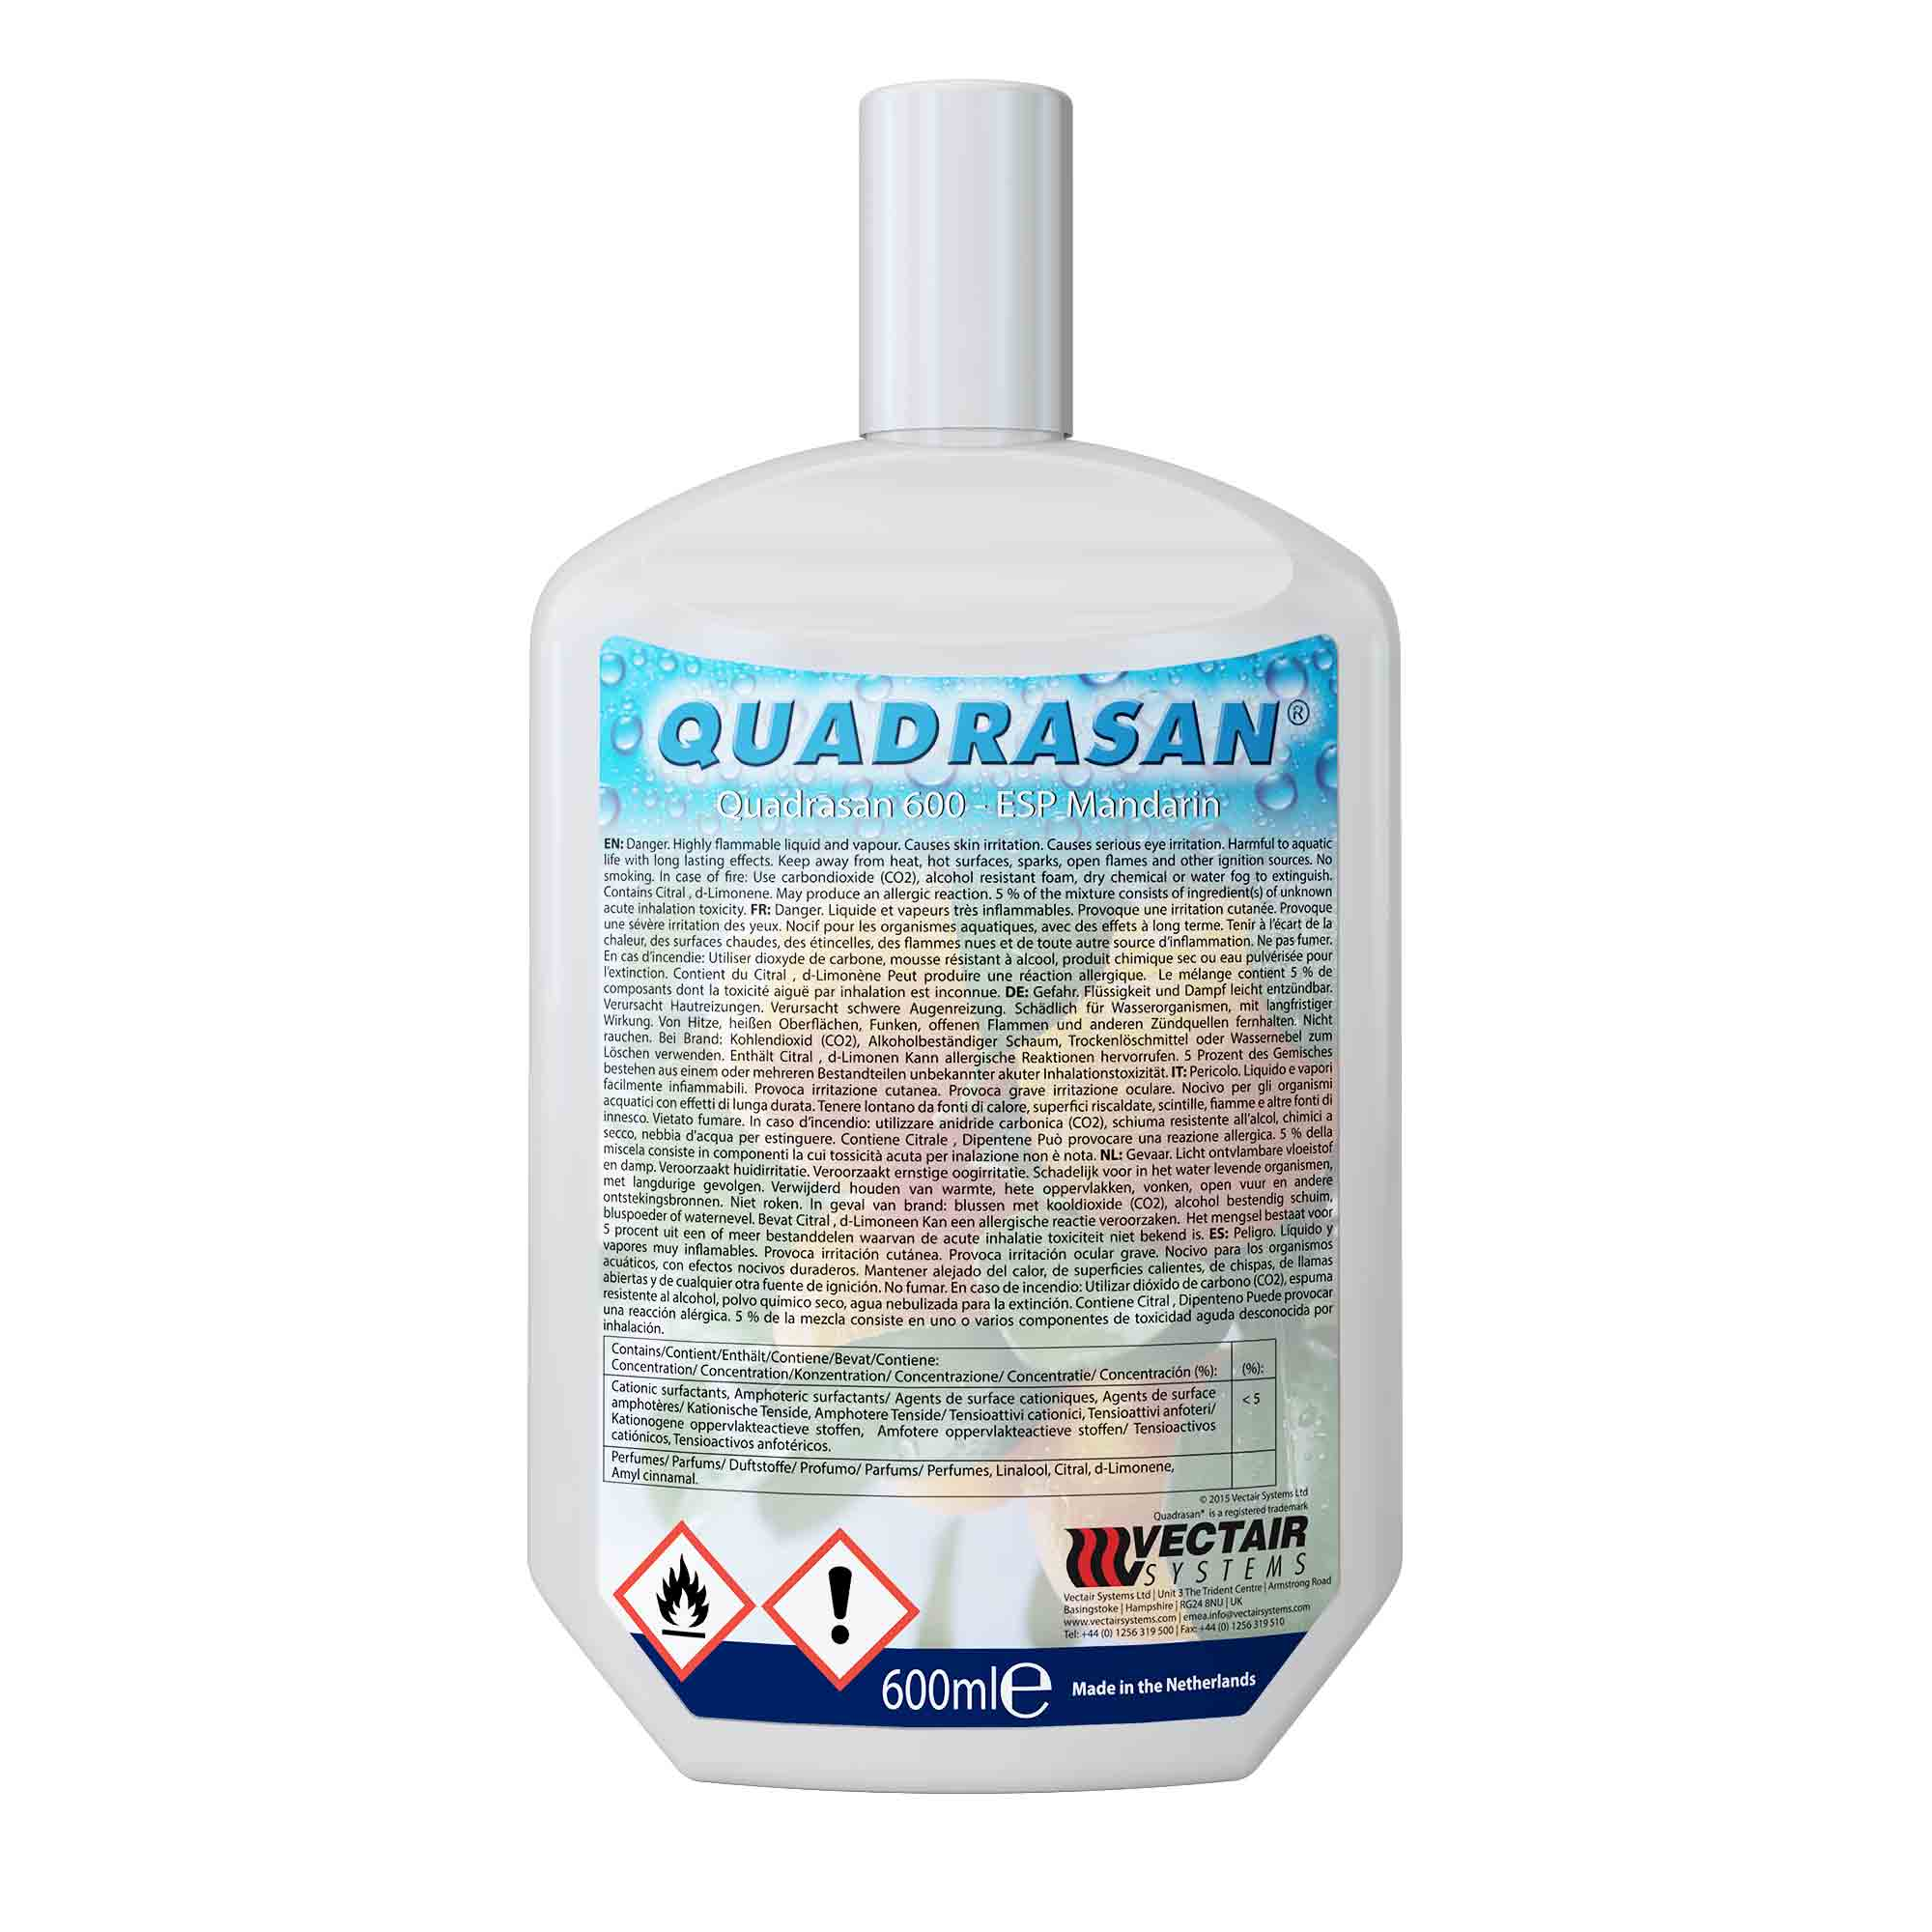 Quadrasan® Cleaning & Dosing Refills